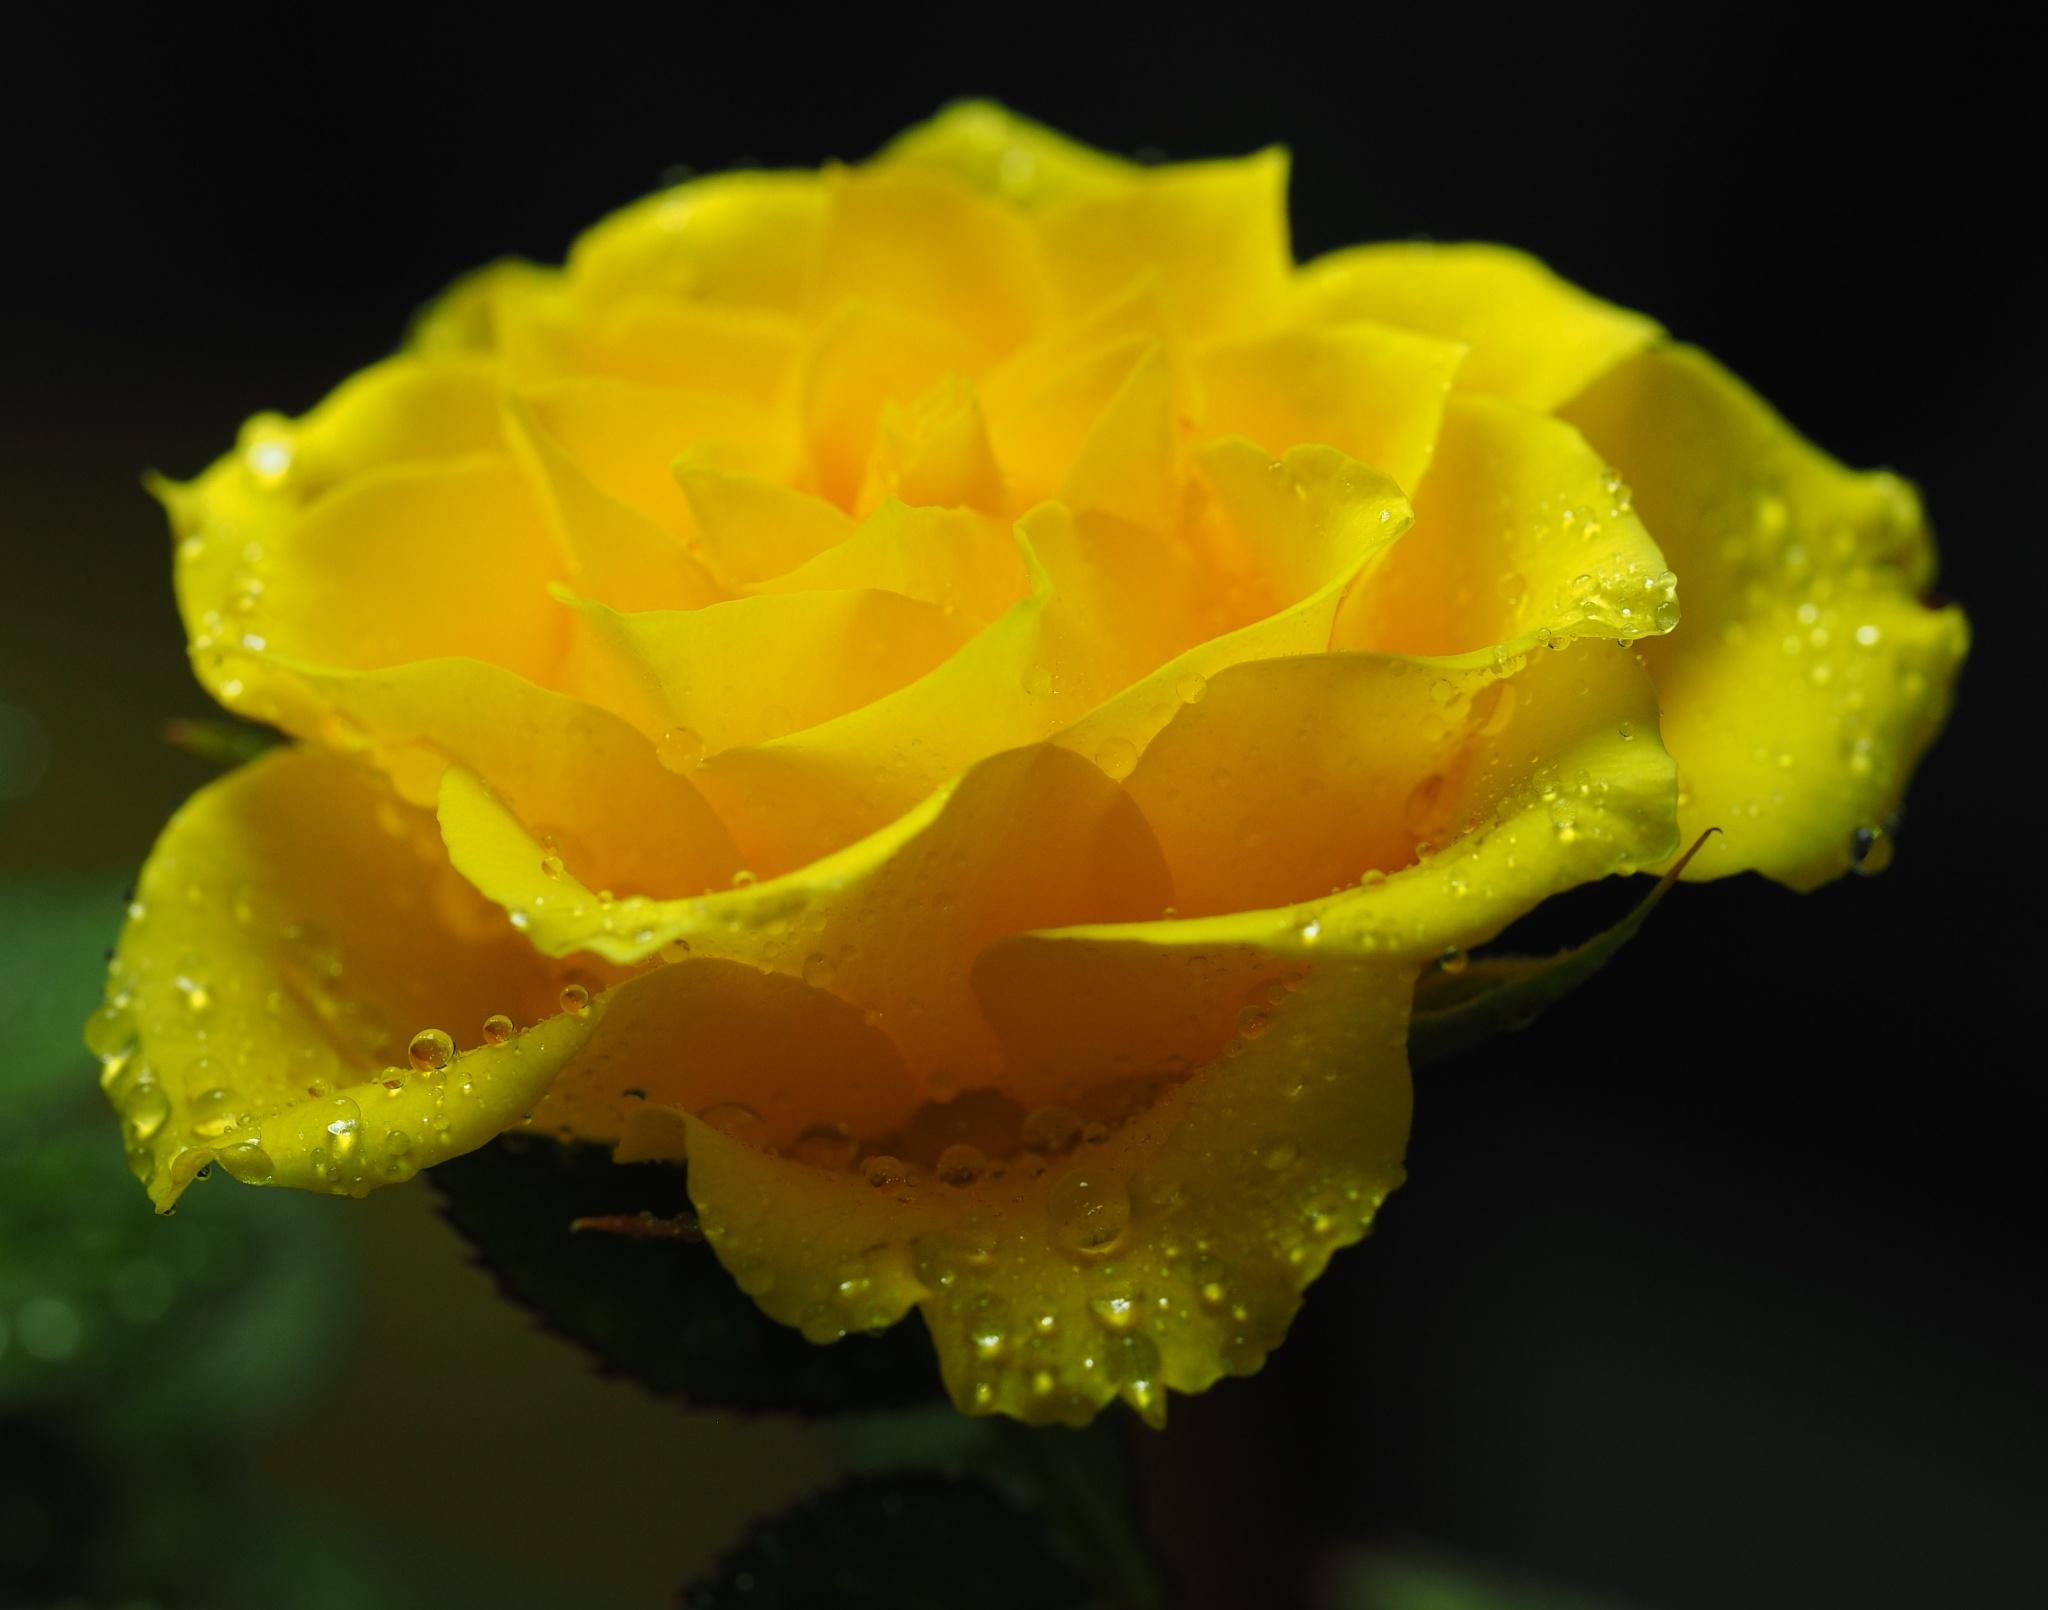 Yellow Petals and Water Drops by Gillian James